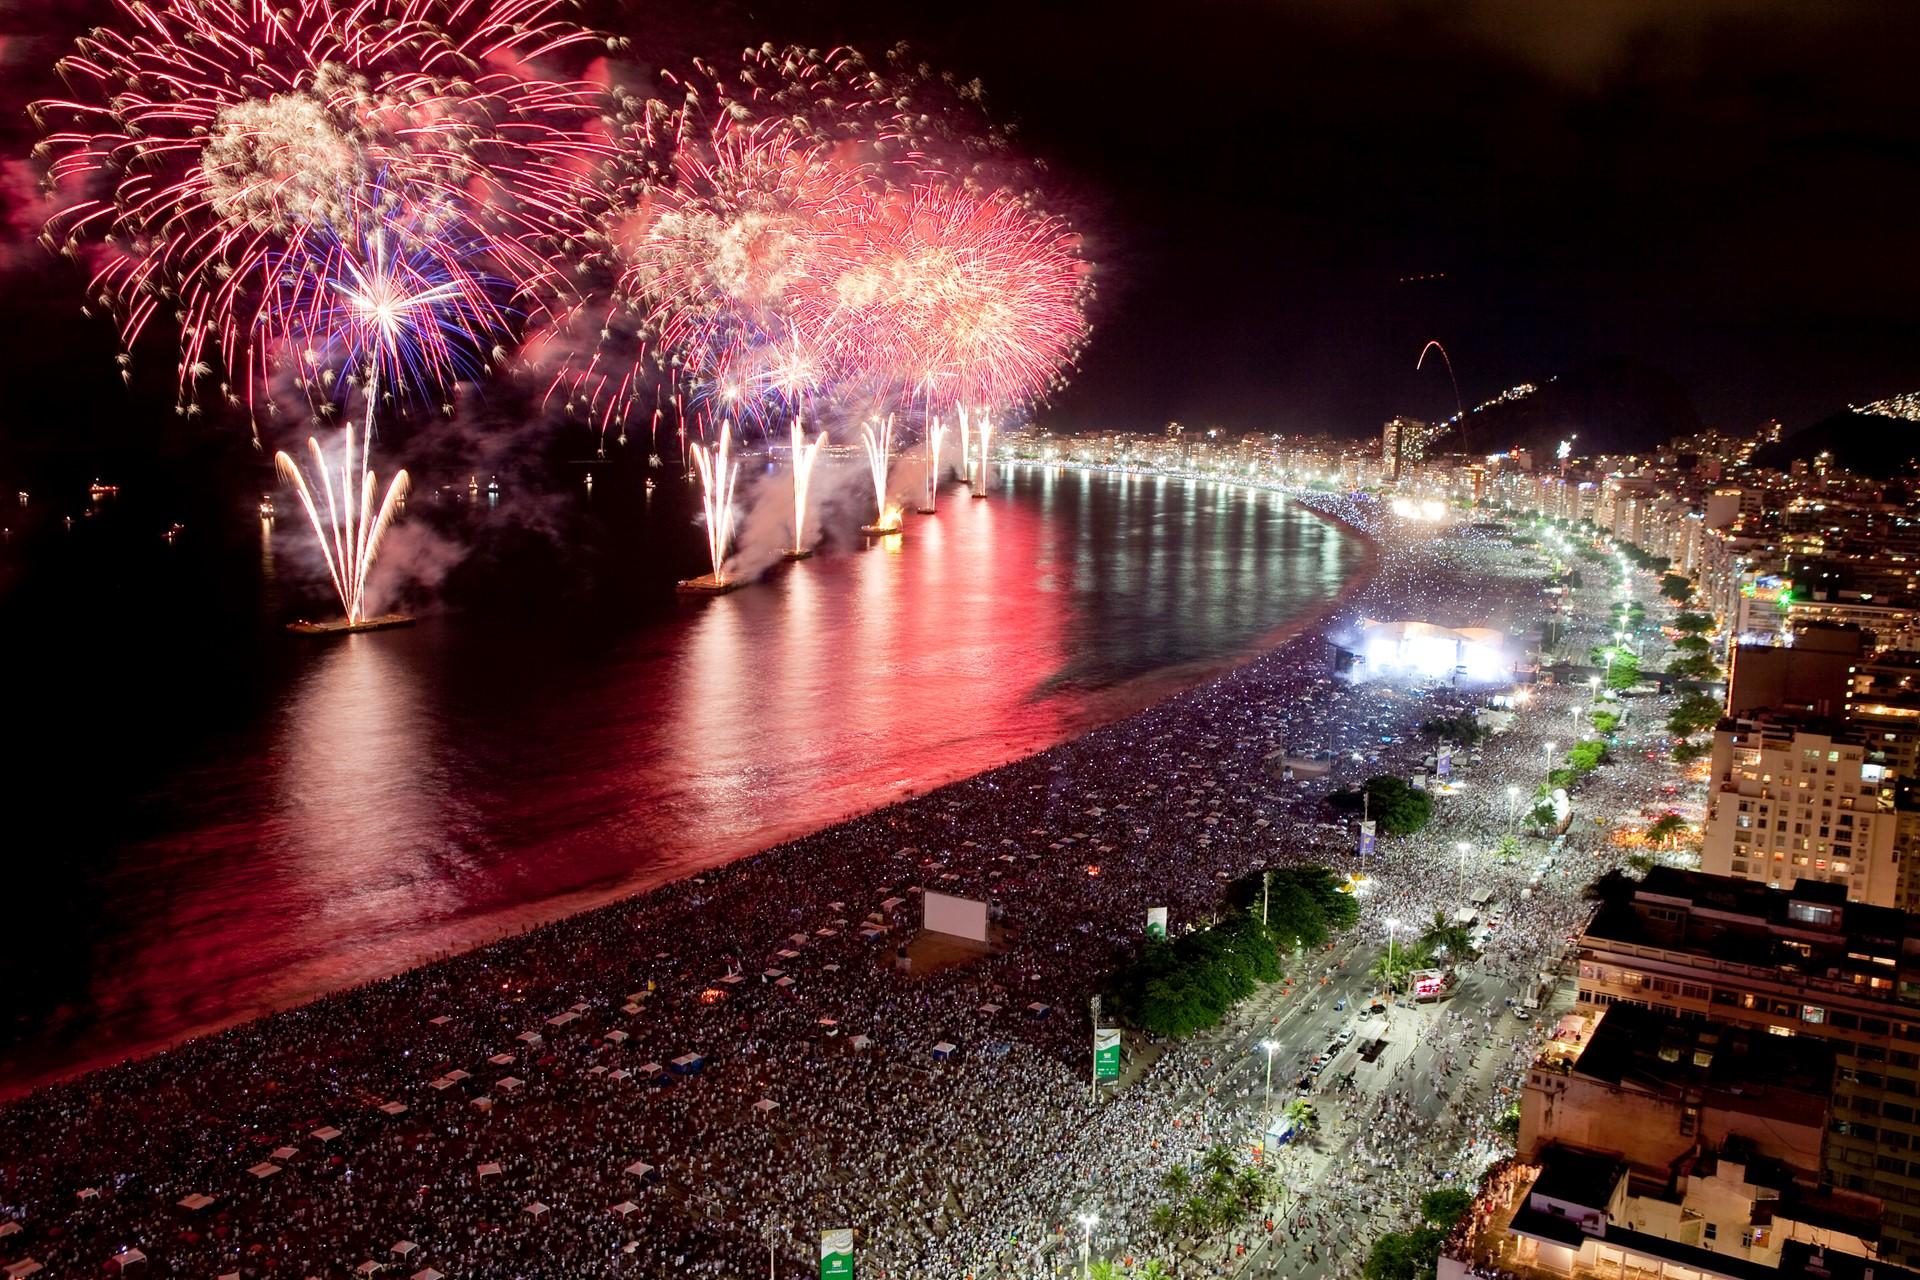 Travel To Copacabana Rio de Janeiro Brazil New Year| Travel